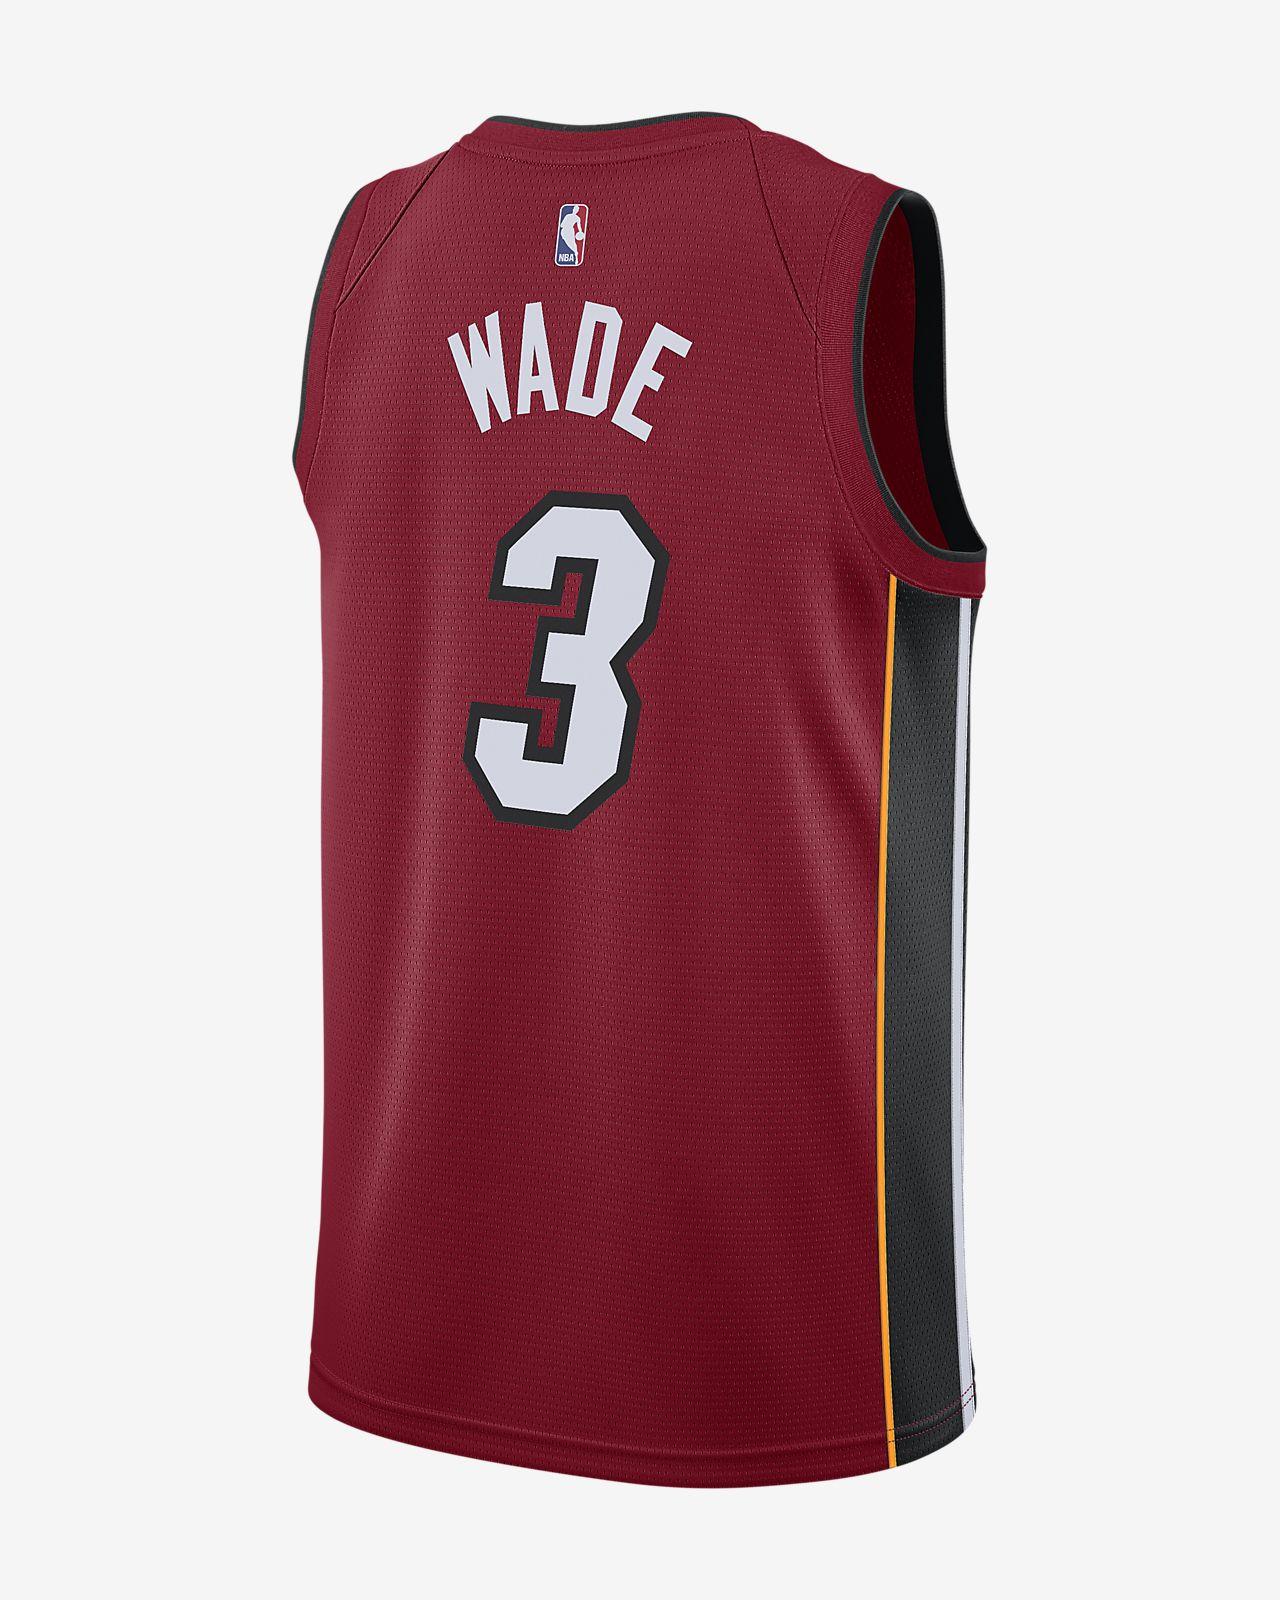 quality design 7f0e8 d6a7a Dwyane Wade Statement Edition Swingman (Miami Heat) Men's Nike NBA  Connected Jersey